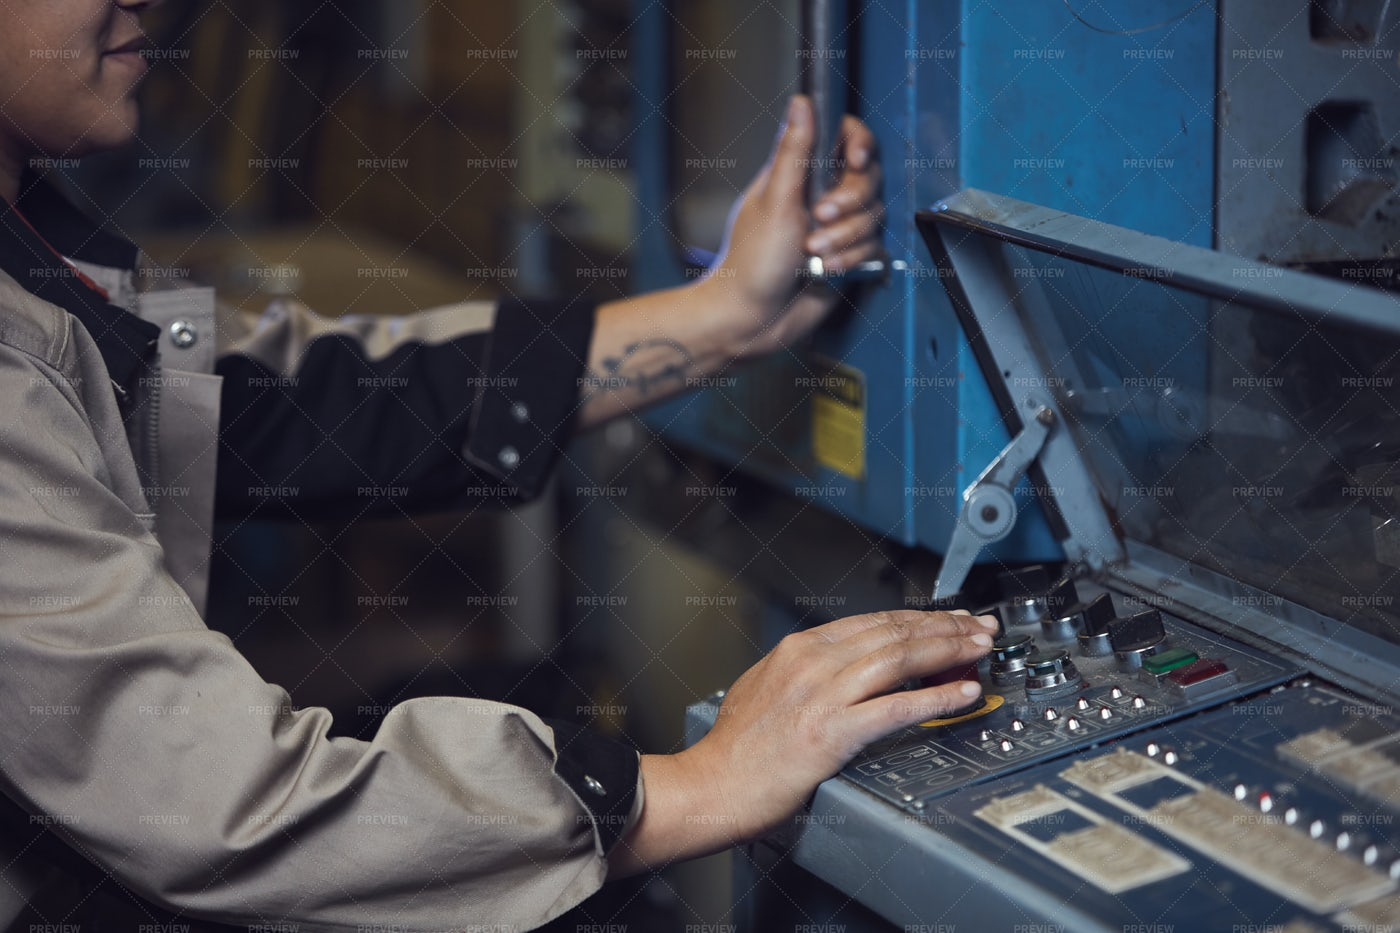 Female Worker Operating Machine...: Stock Photos